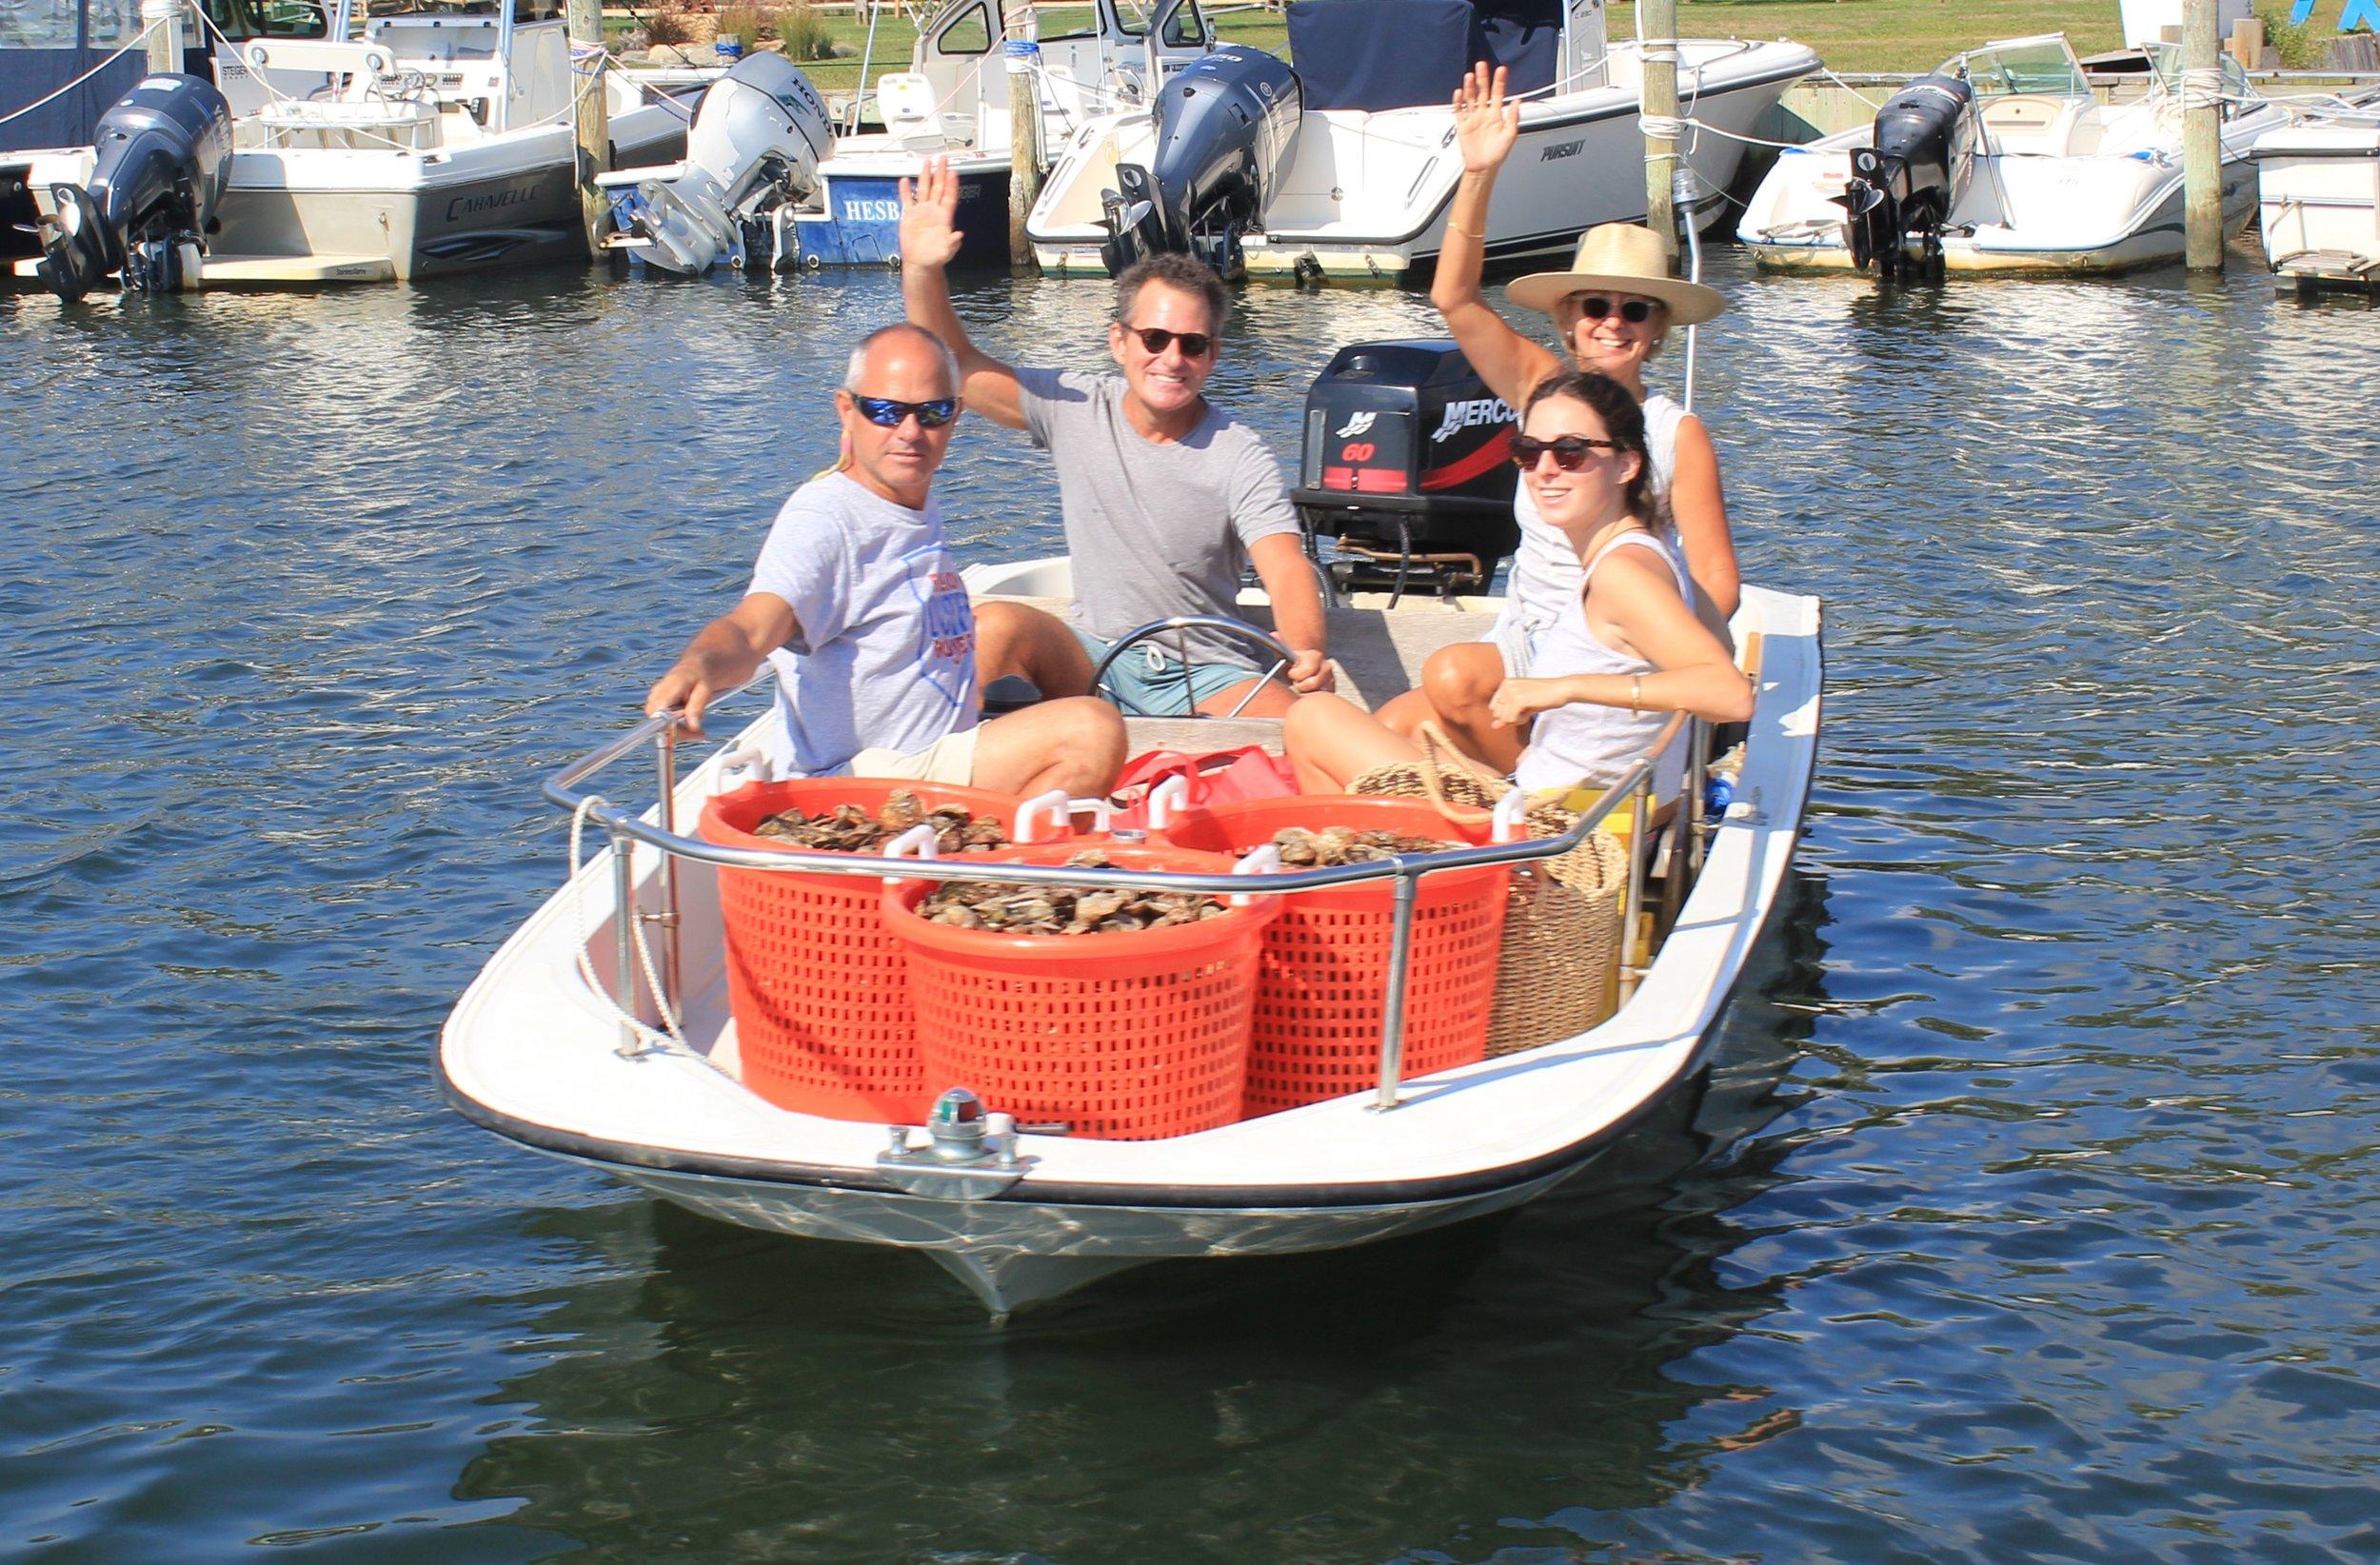 Scnd Plnt oysters in Boston Whaler.JPG